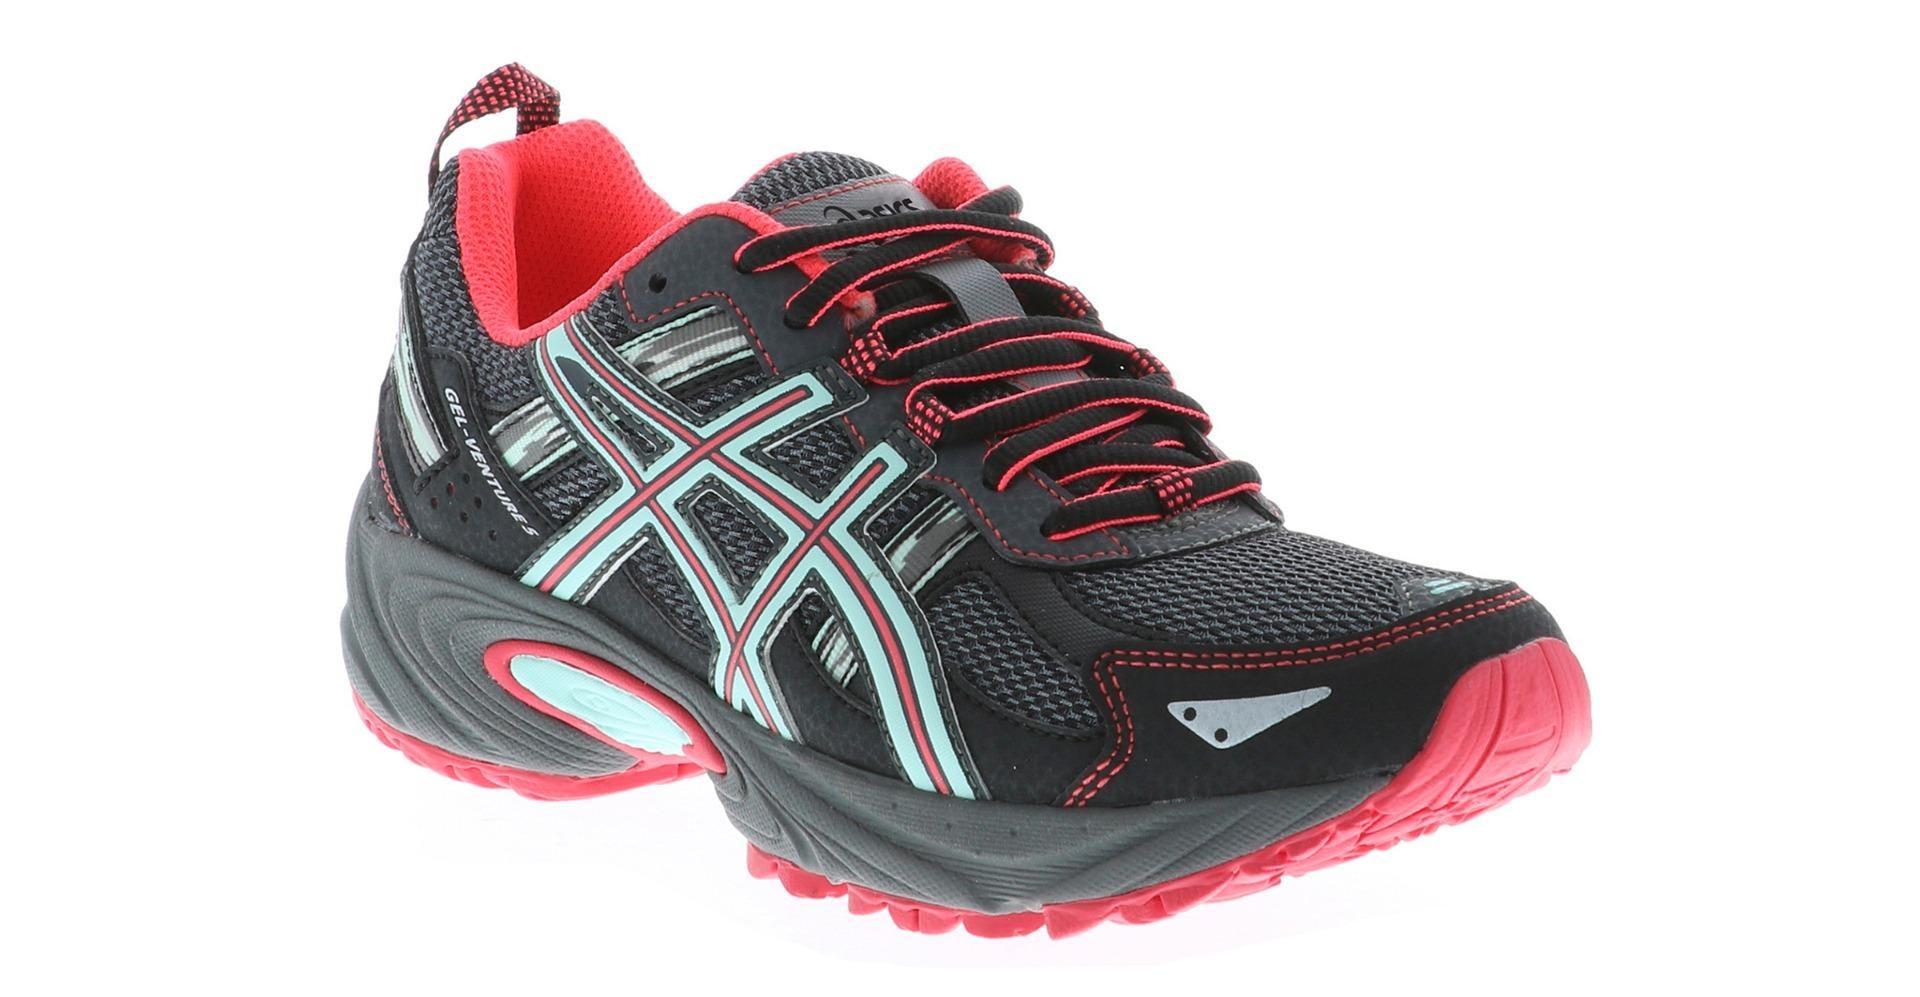 5 Venture Sensation Shoes Hiking Wide Asics Gel shoe Women's 8POkwXNZn0